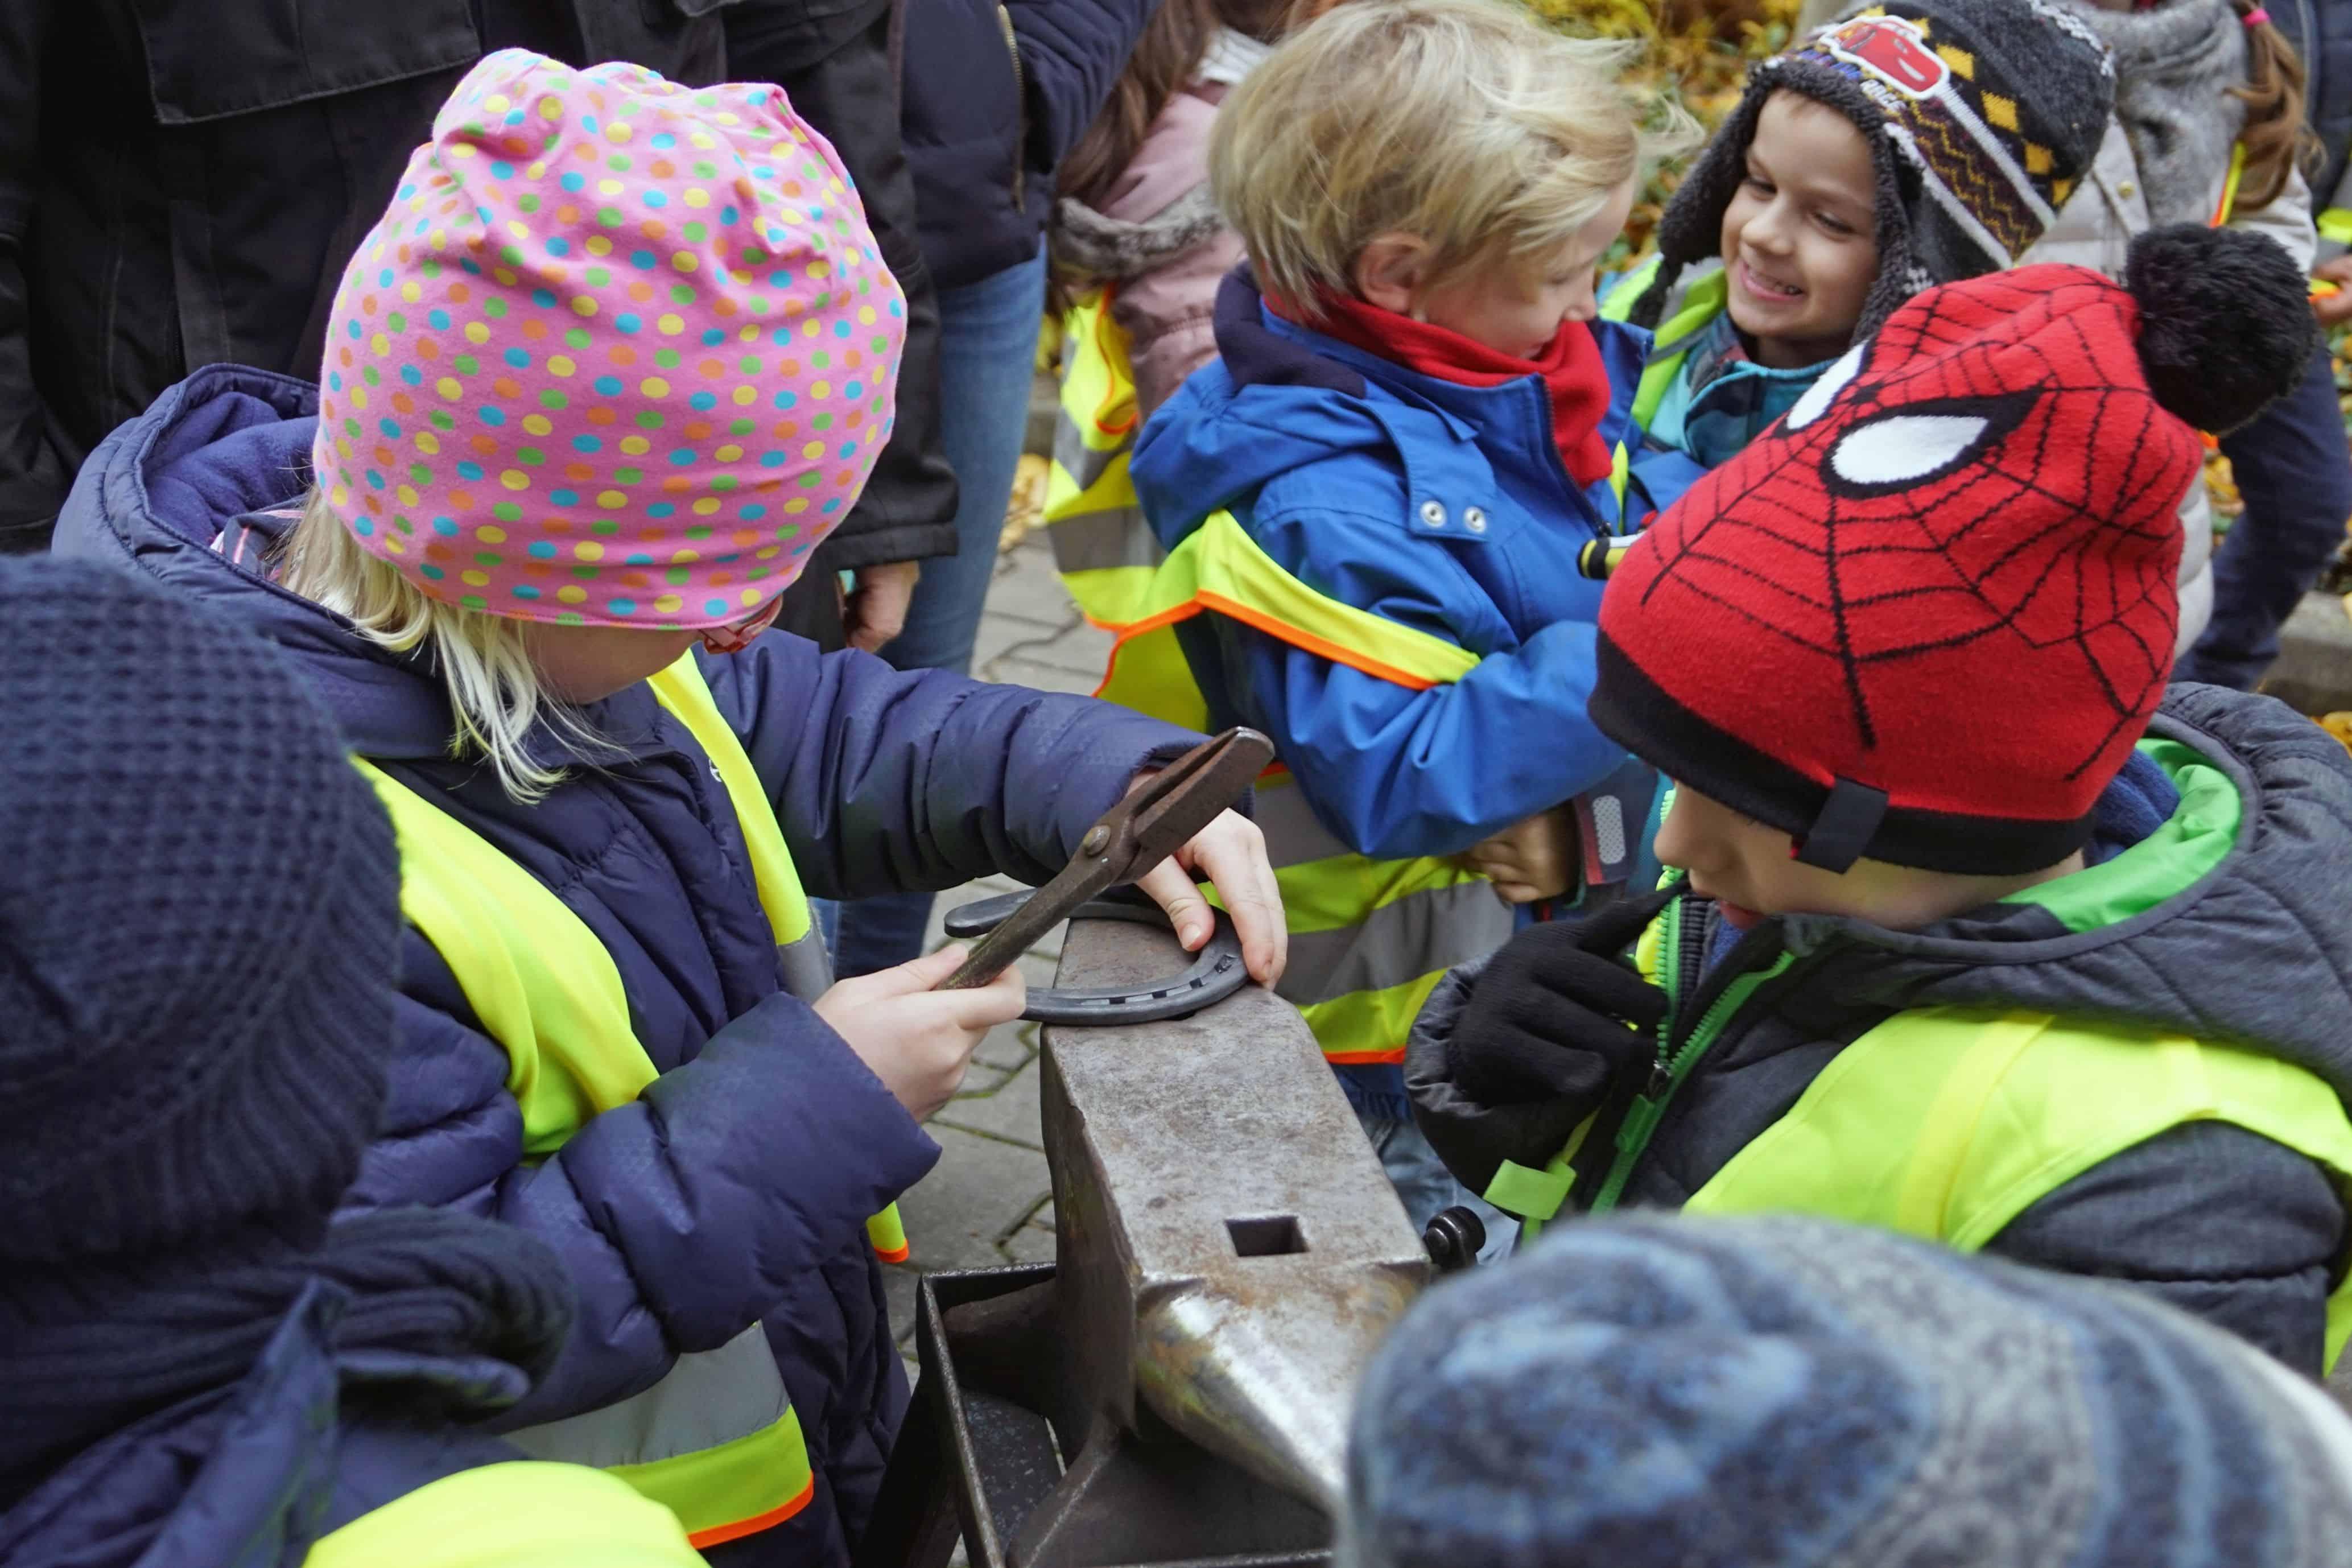 holzpferde für kinder spenden | barnboox.de | pferdewissen online